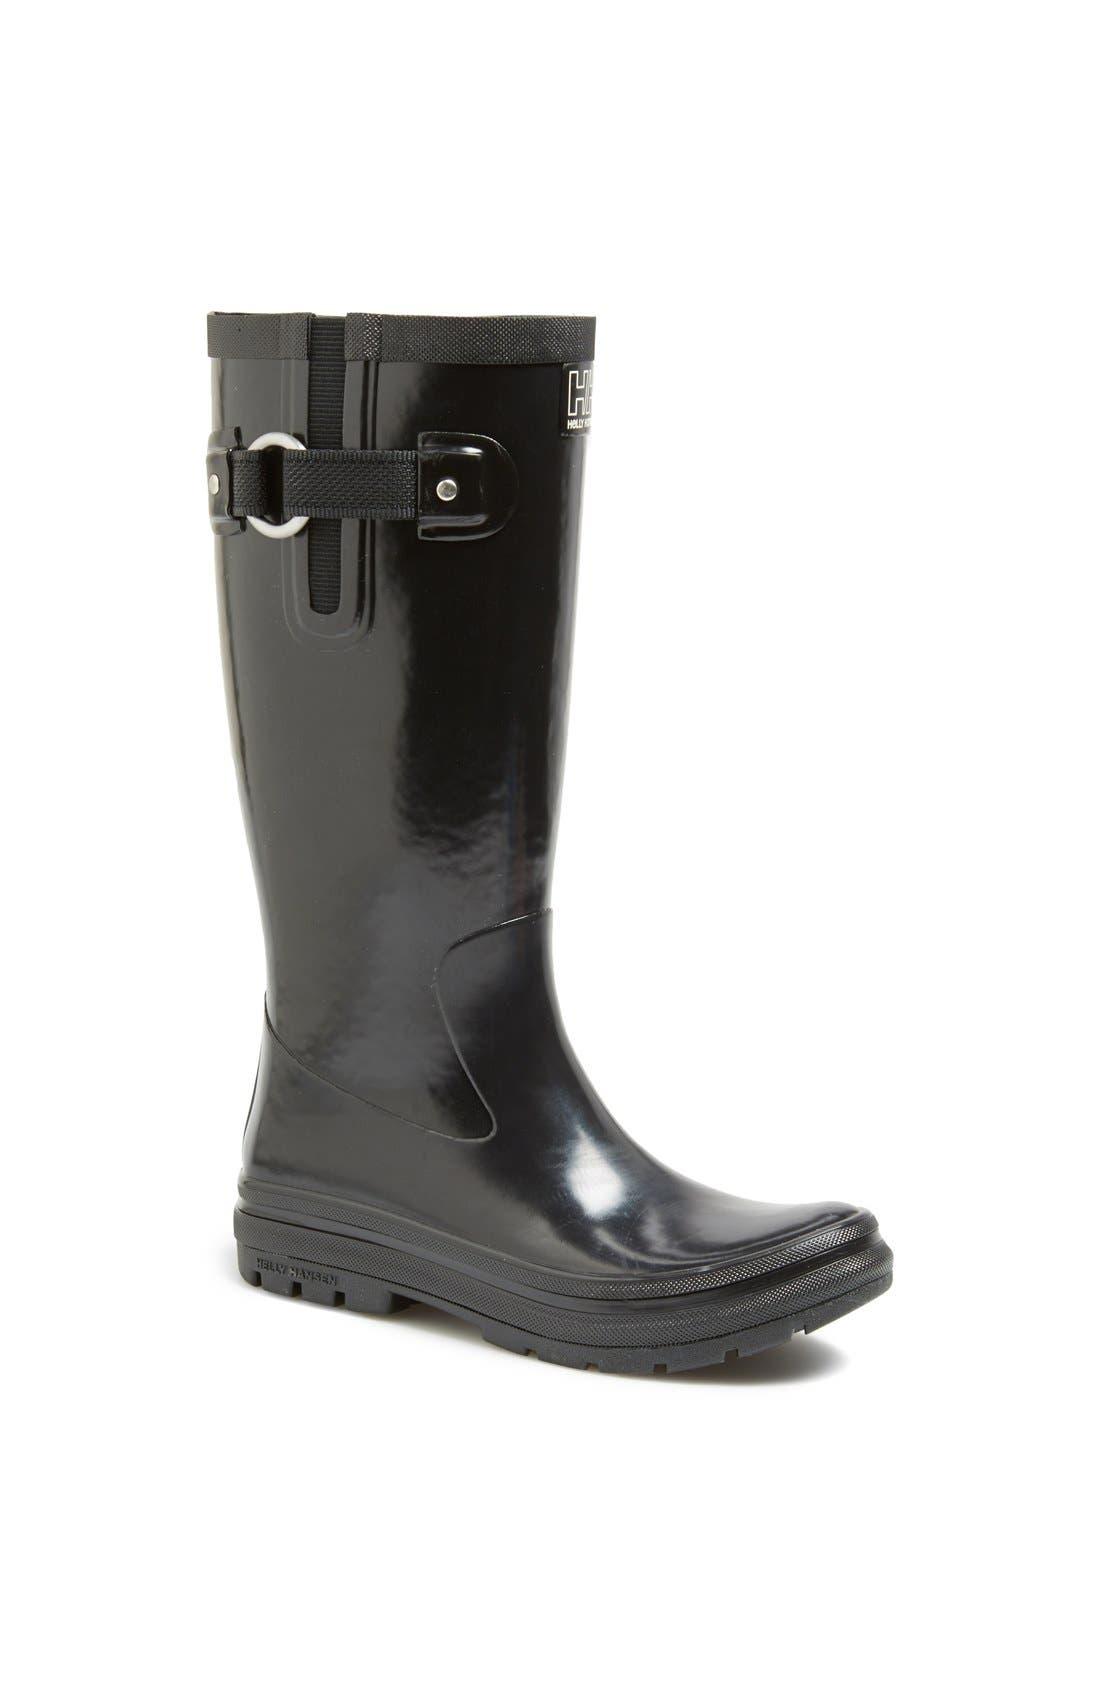 Main Image - Helly Hansen 'Veierland' Rain Boot